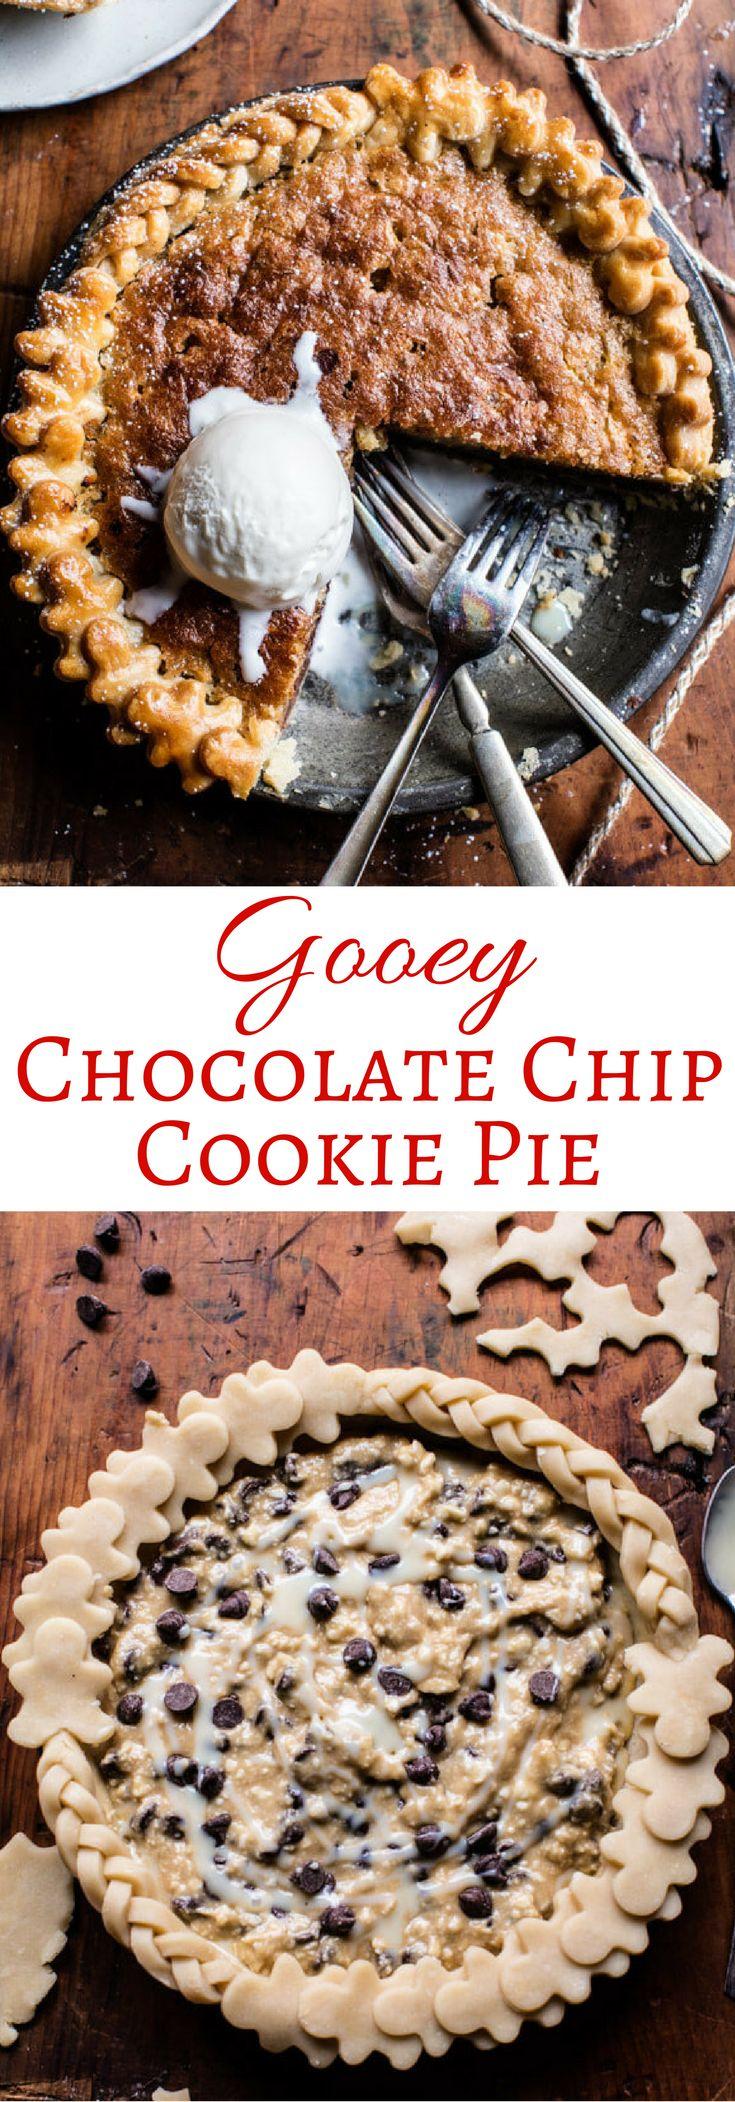 Gooey Chocolate Chip Cookie Pie | halfbakedharvest.com @hbharvest